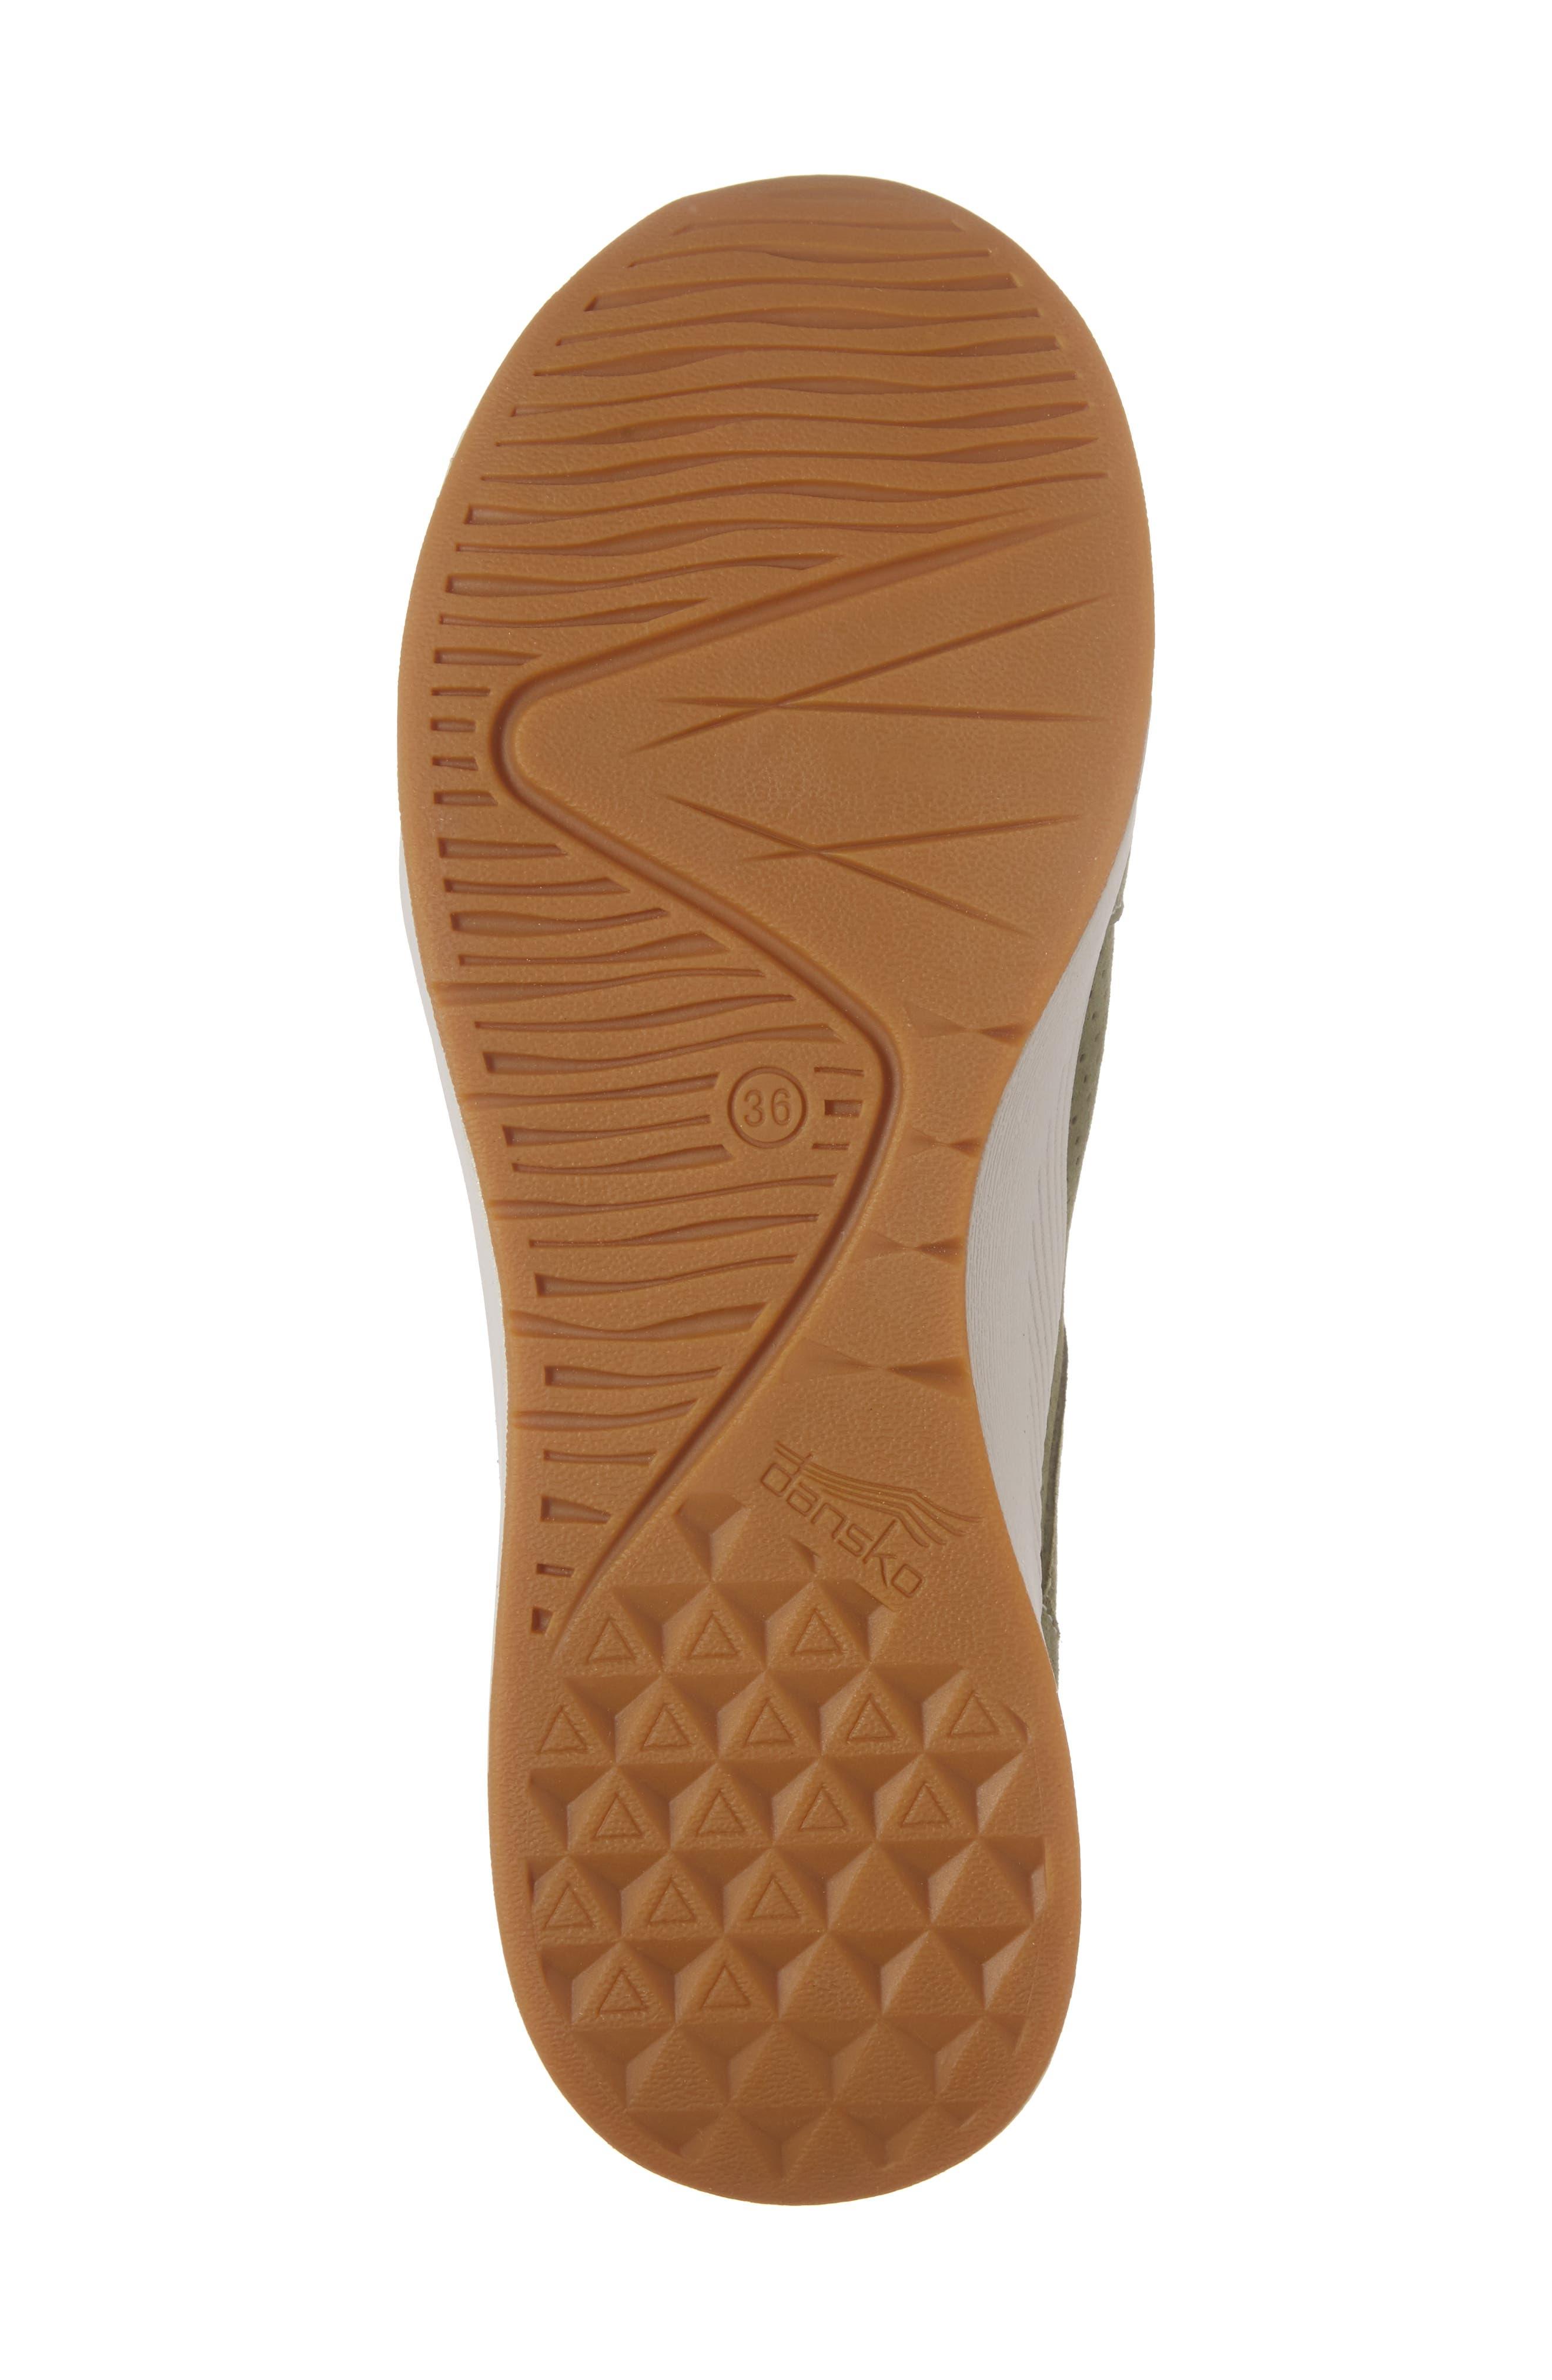 Cozette Slip-On Sneaker,                             Alternate thumbnail 6, color,                             Sage Suede